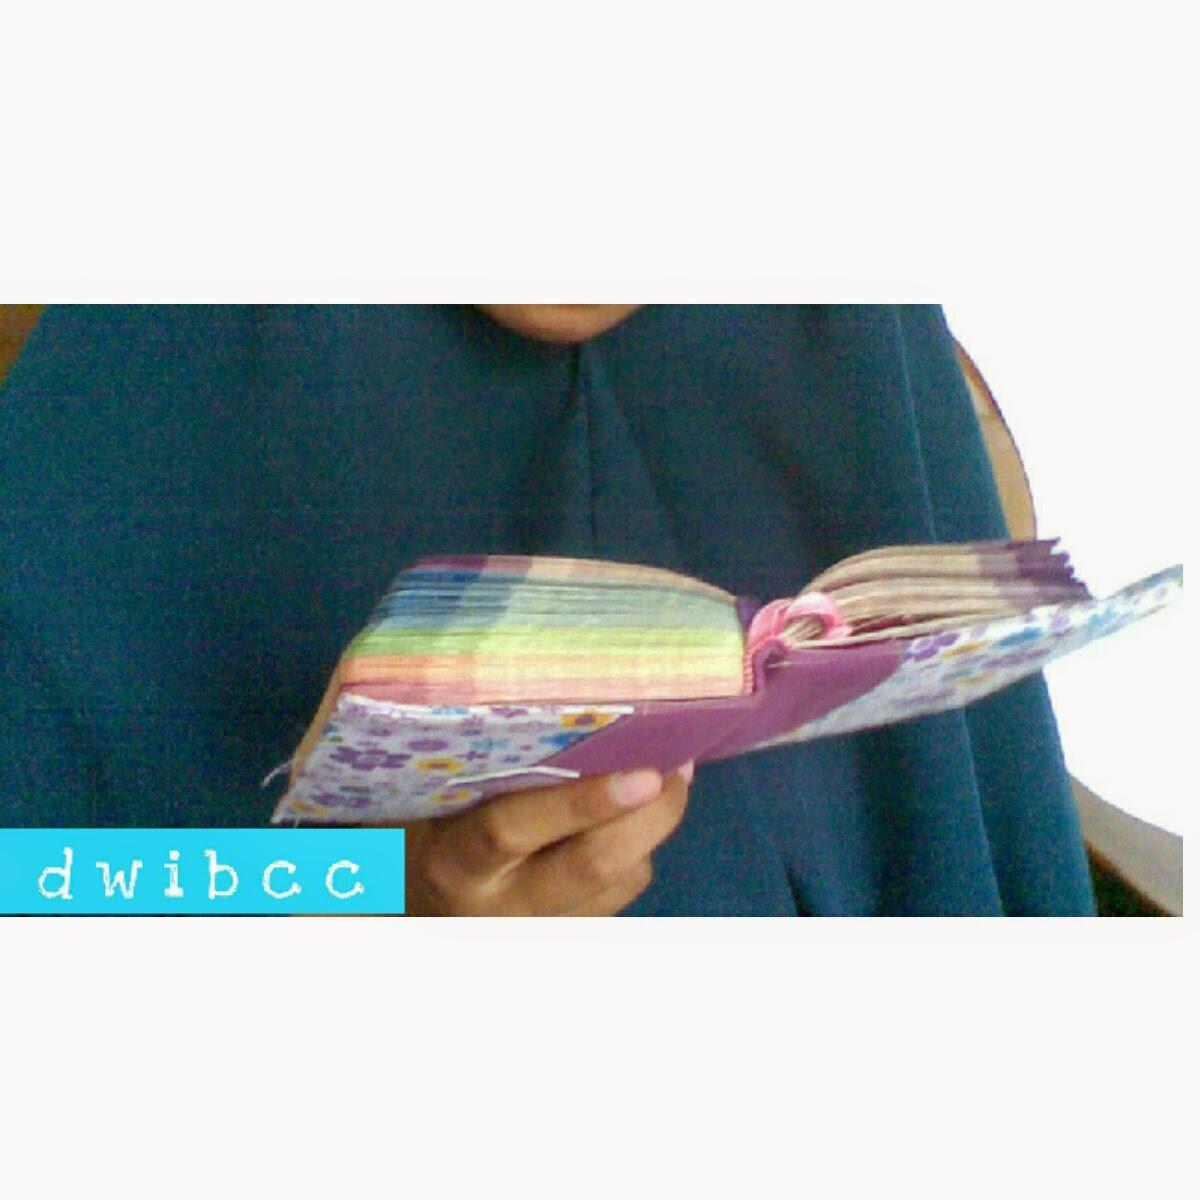 dwibcc Al-Quran Rainbow